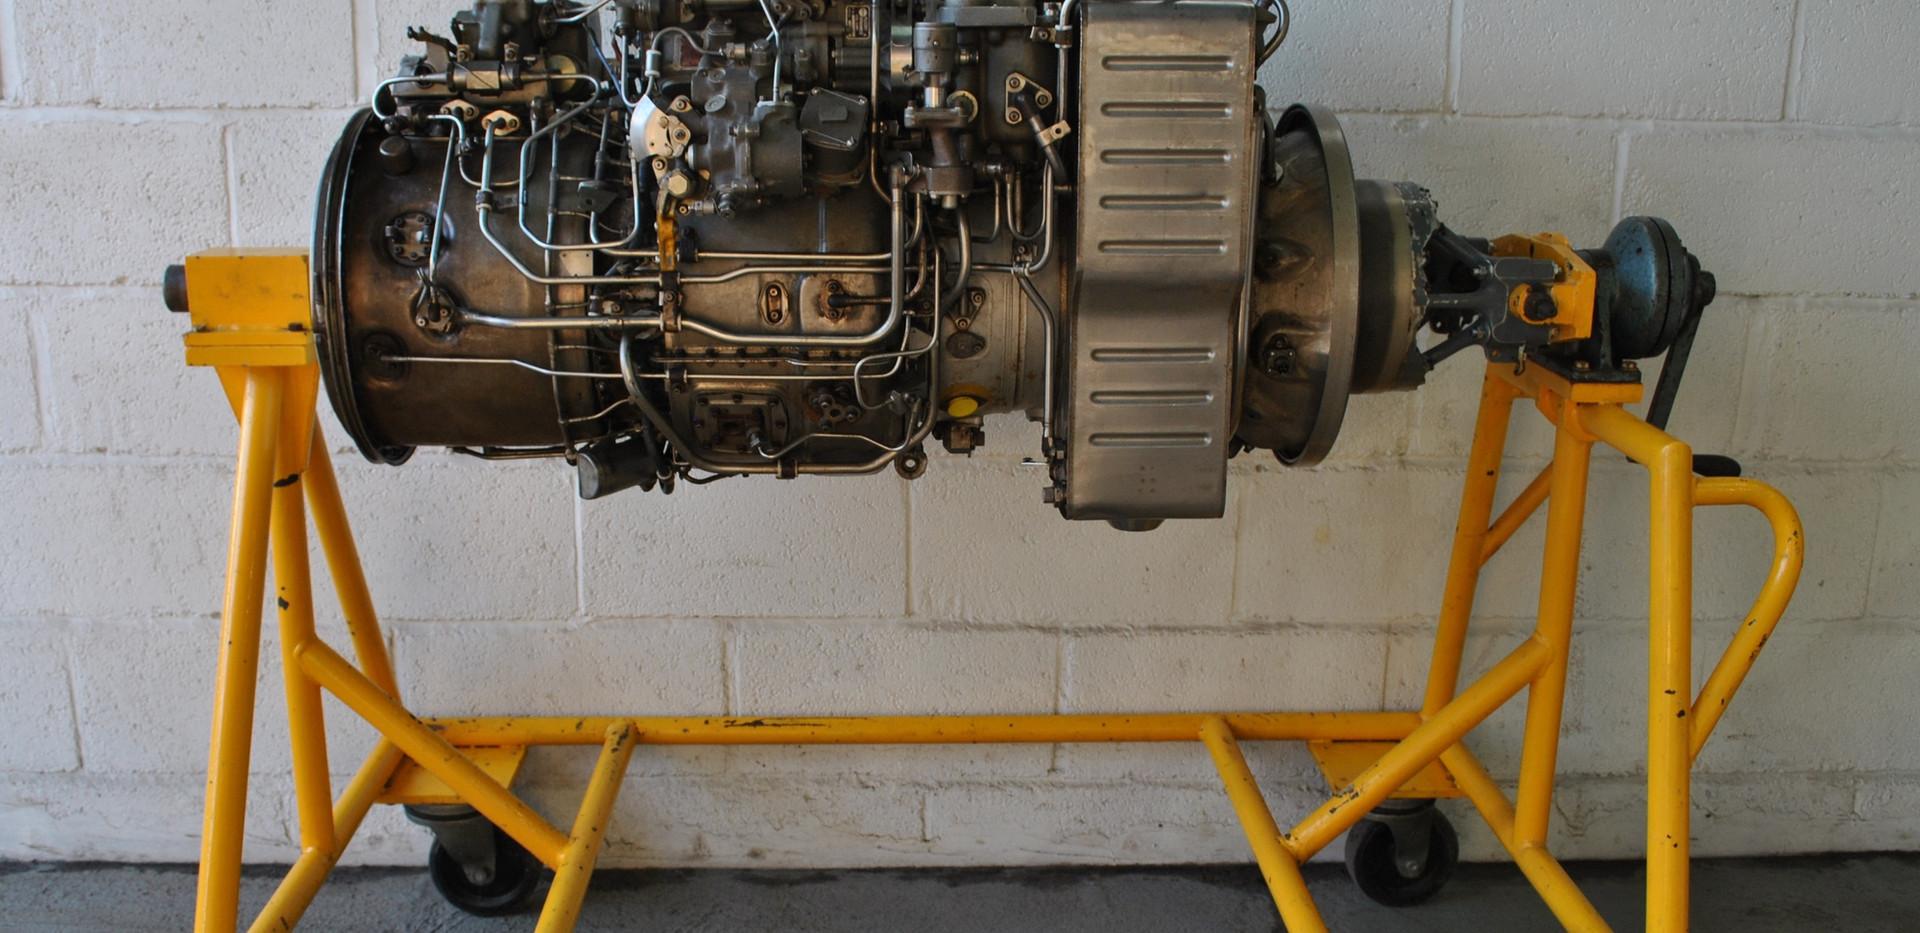 Rolls Royce Gem Engine in Stand (25).JPG